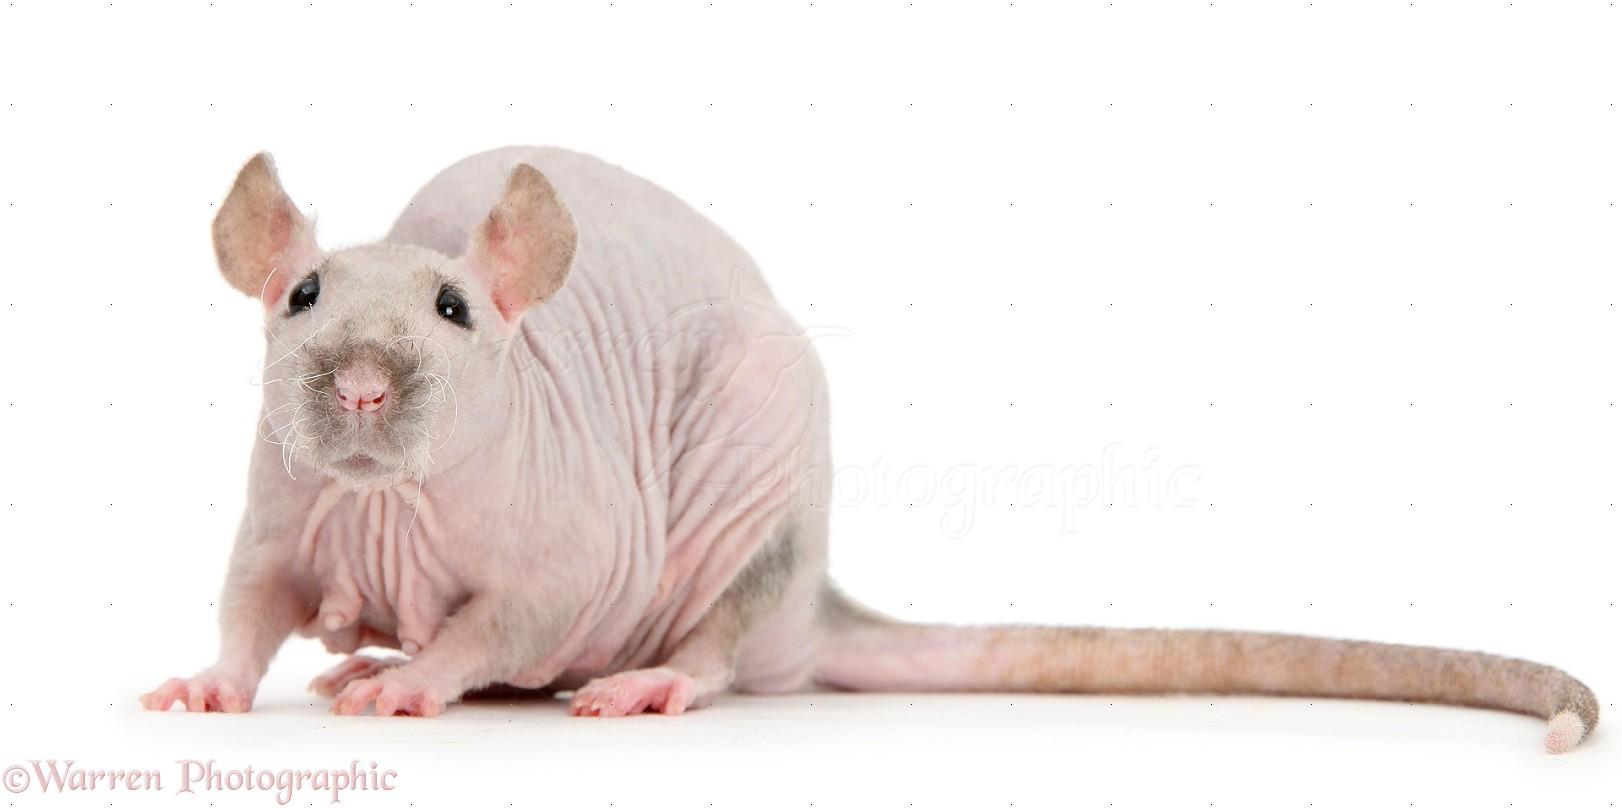 Sphynx Rat photo WP40156